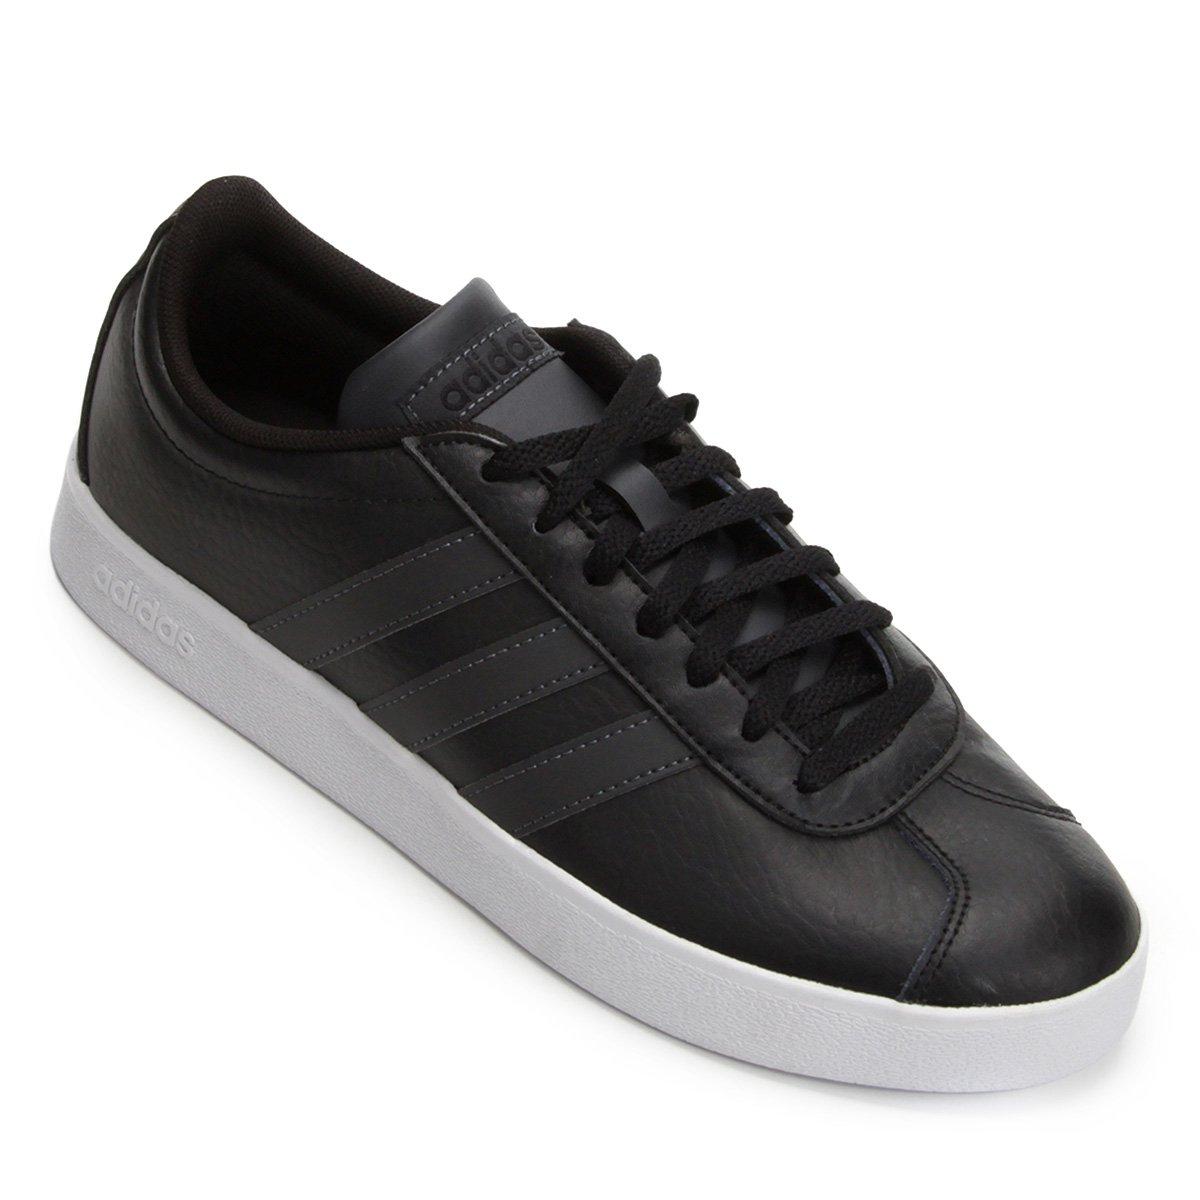 e9cc6058 Tênis Adidas VL Court 2.0 Masculino | Allianz Parque Shop